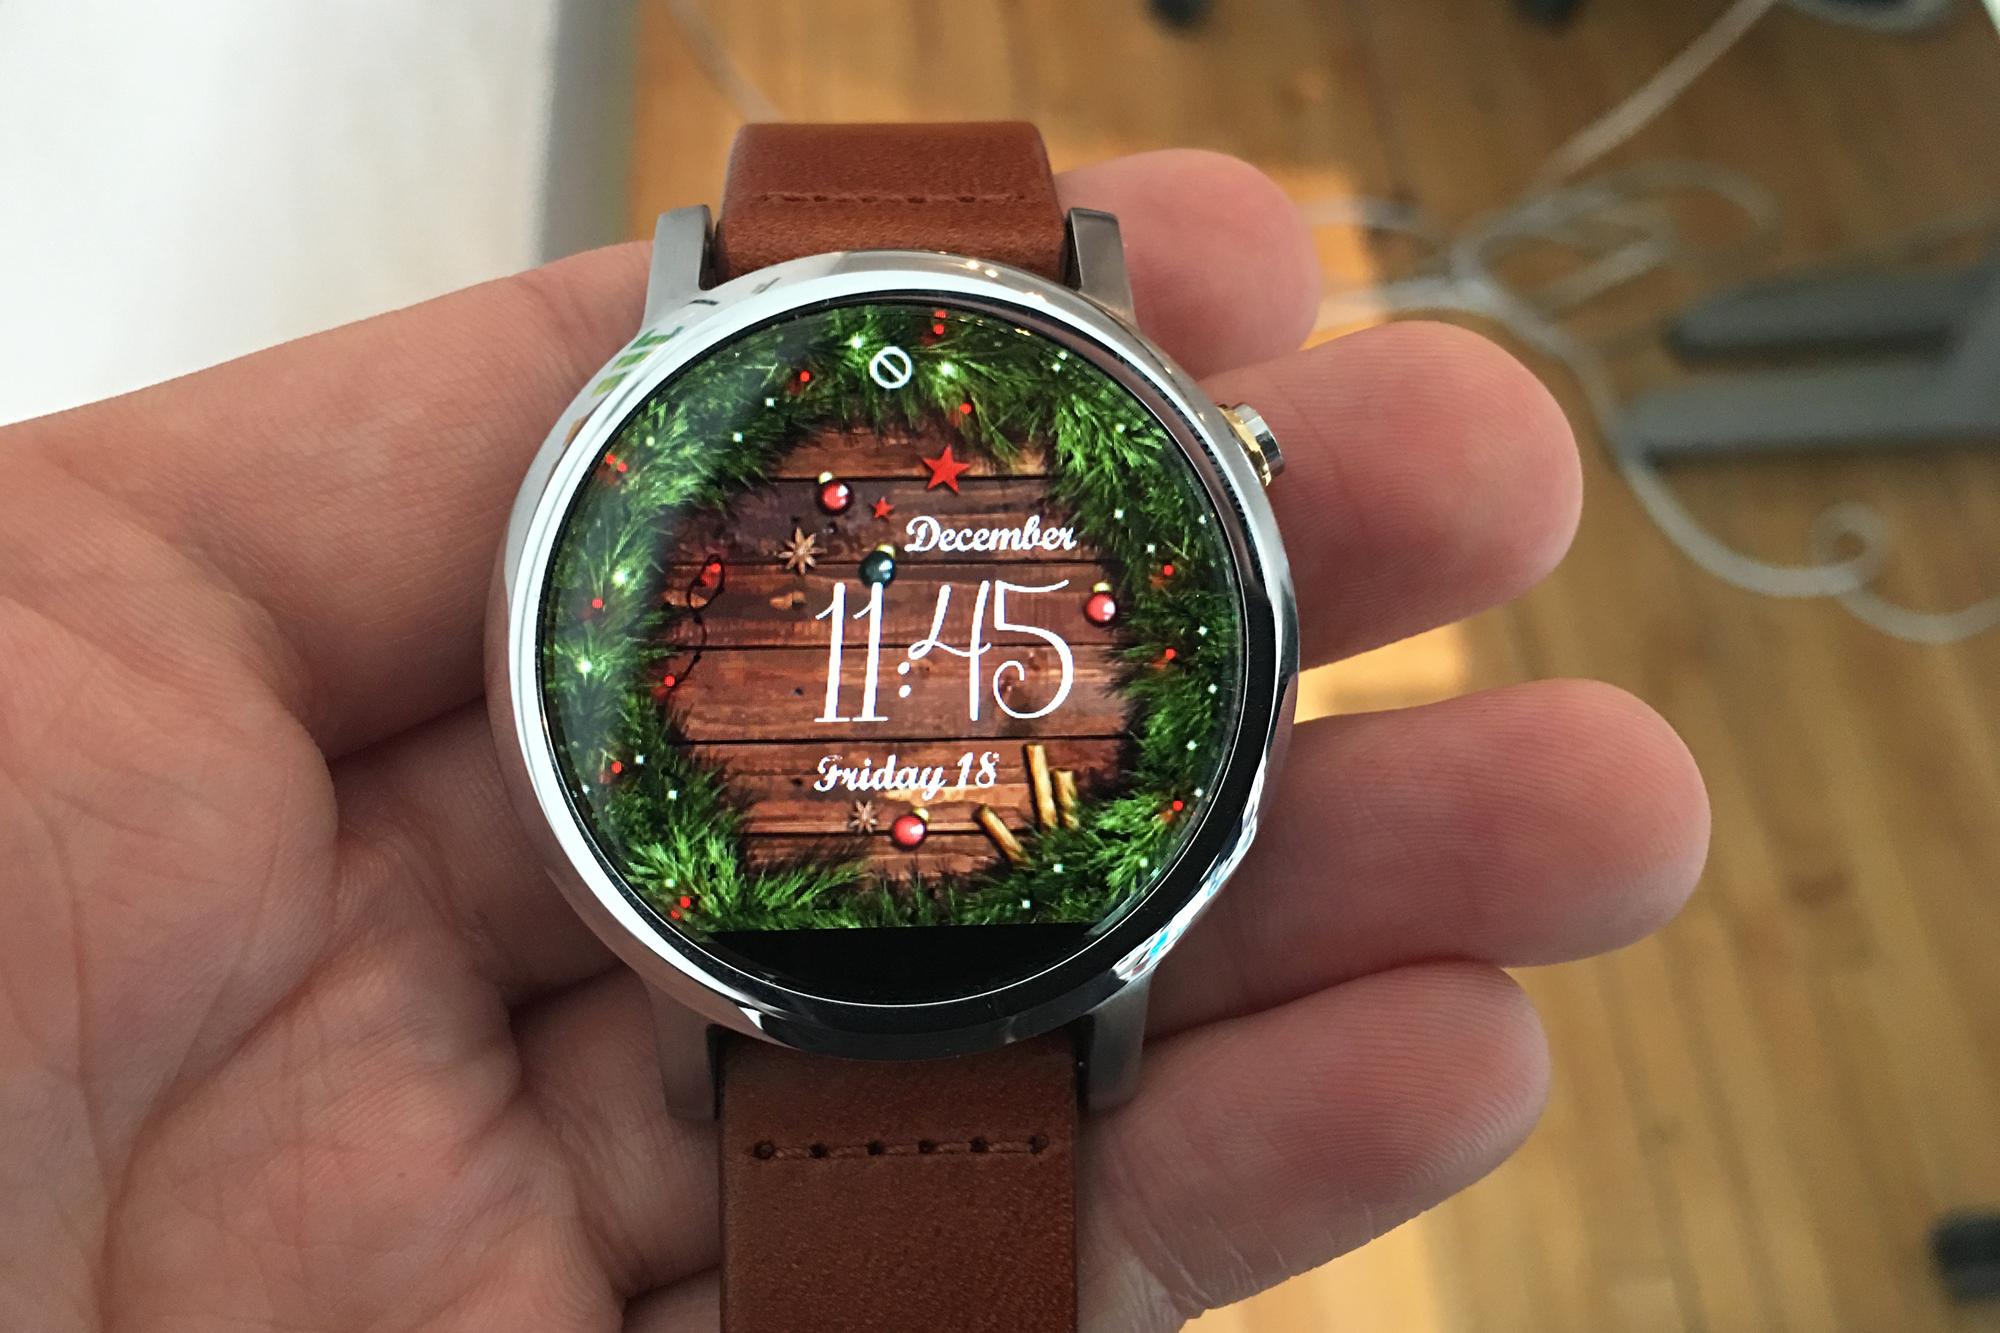 watchfacechristmas